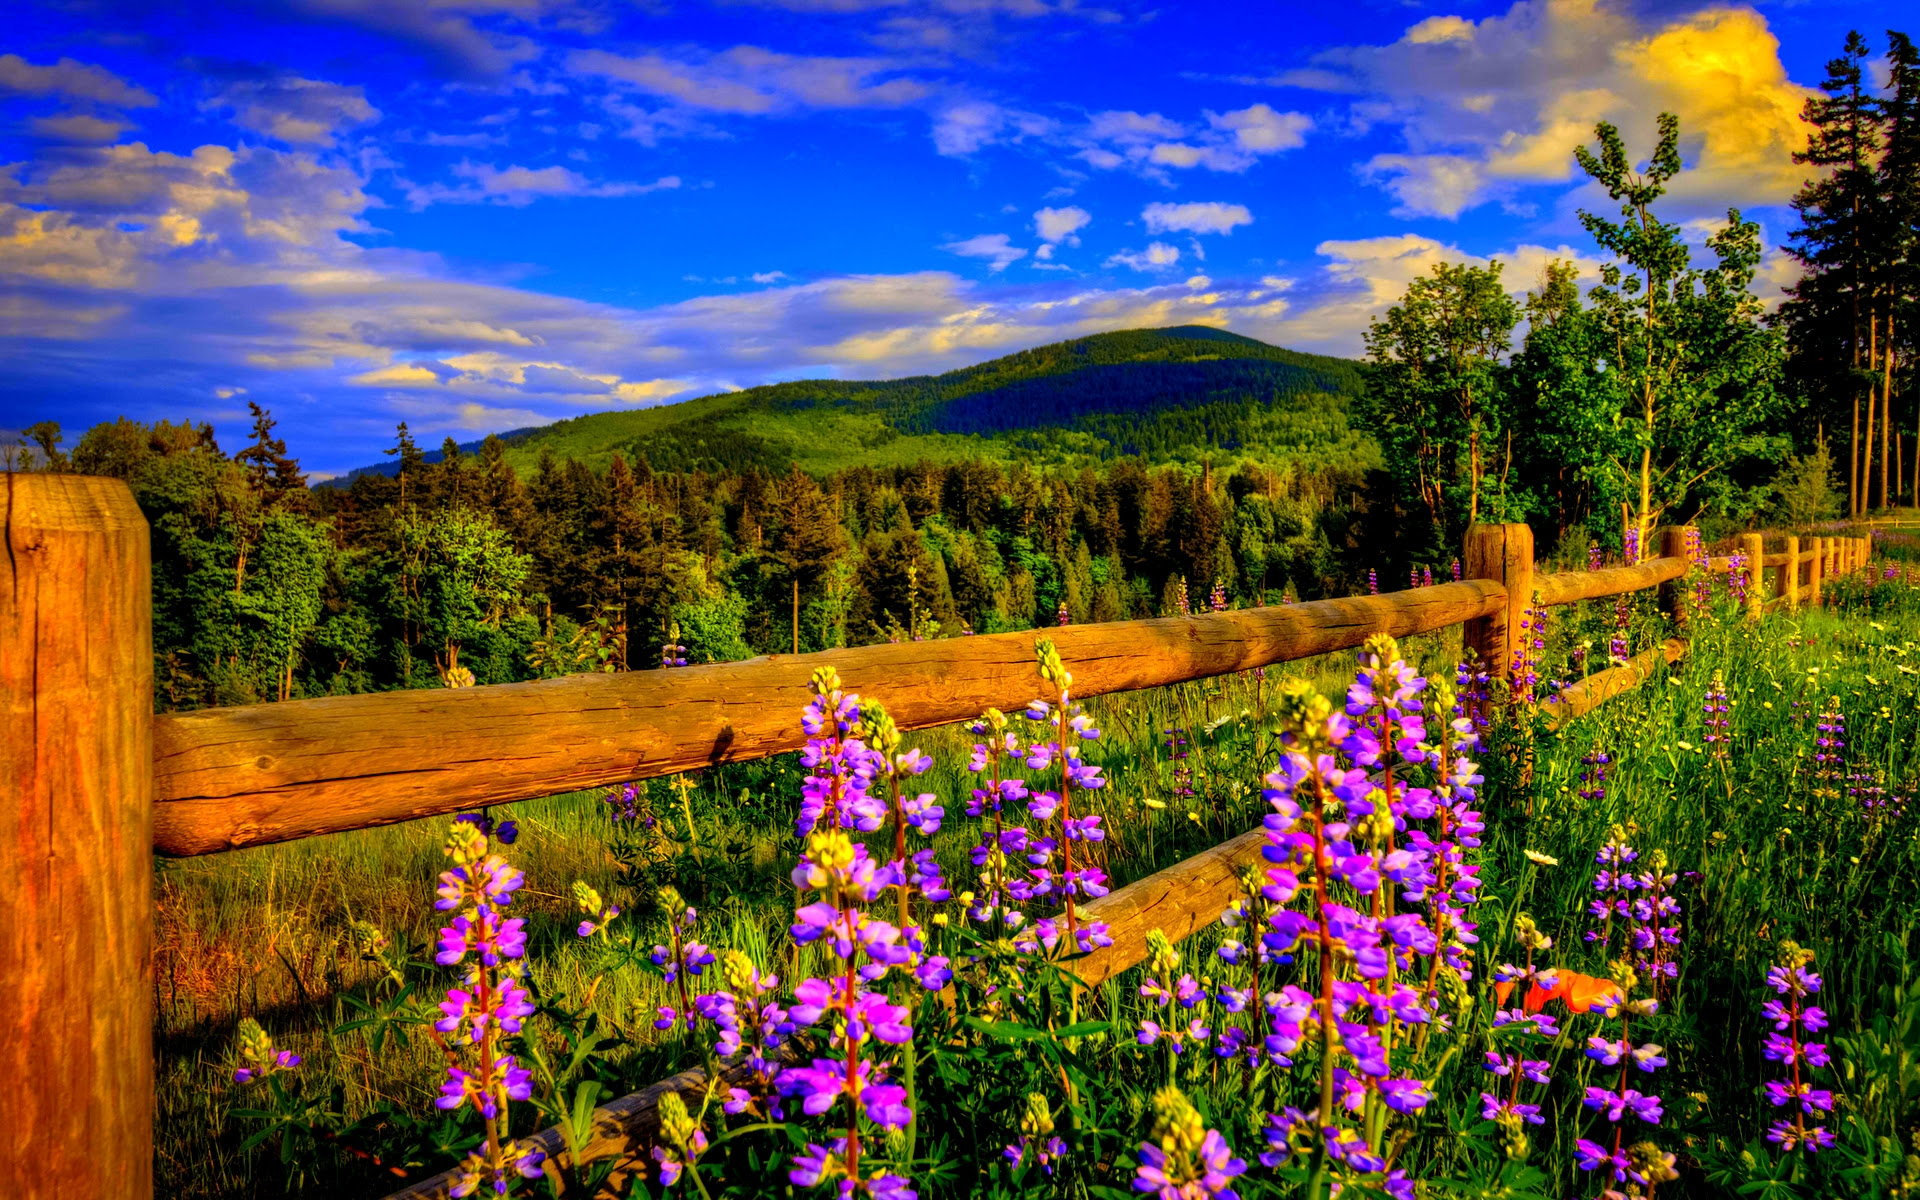 spring wallpaper cool flowers  HD Desktop Wallpapers  4k HD